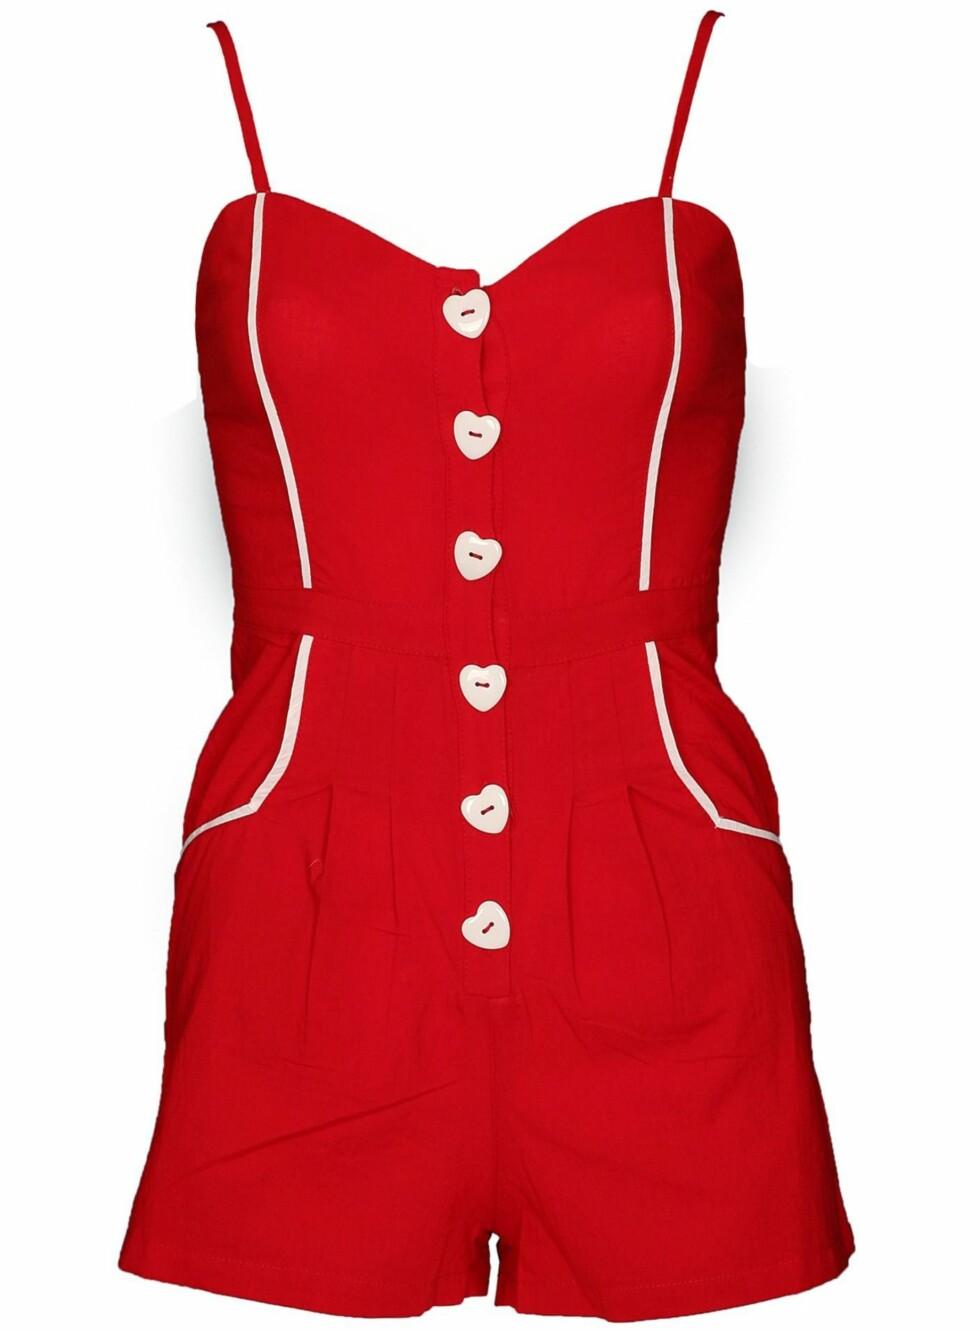 Snuppete bukseshorts i pinup-stil med hjerteknapper og tynne stropper (Rare Fashion/Fashionmixology.no).